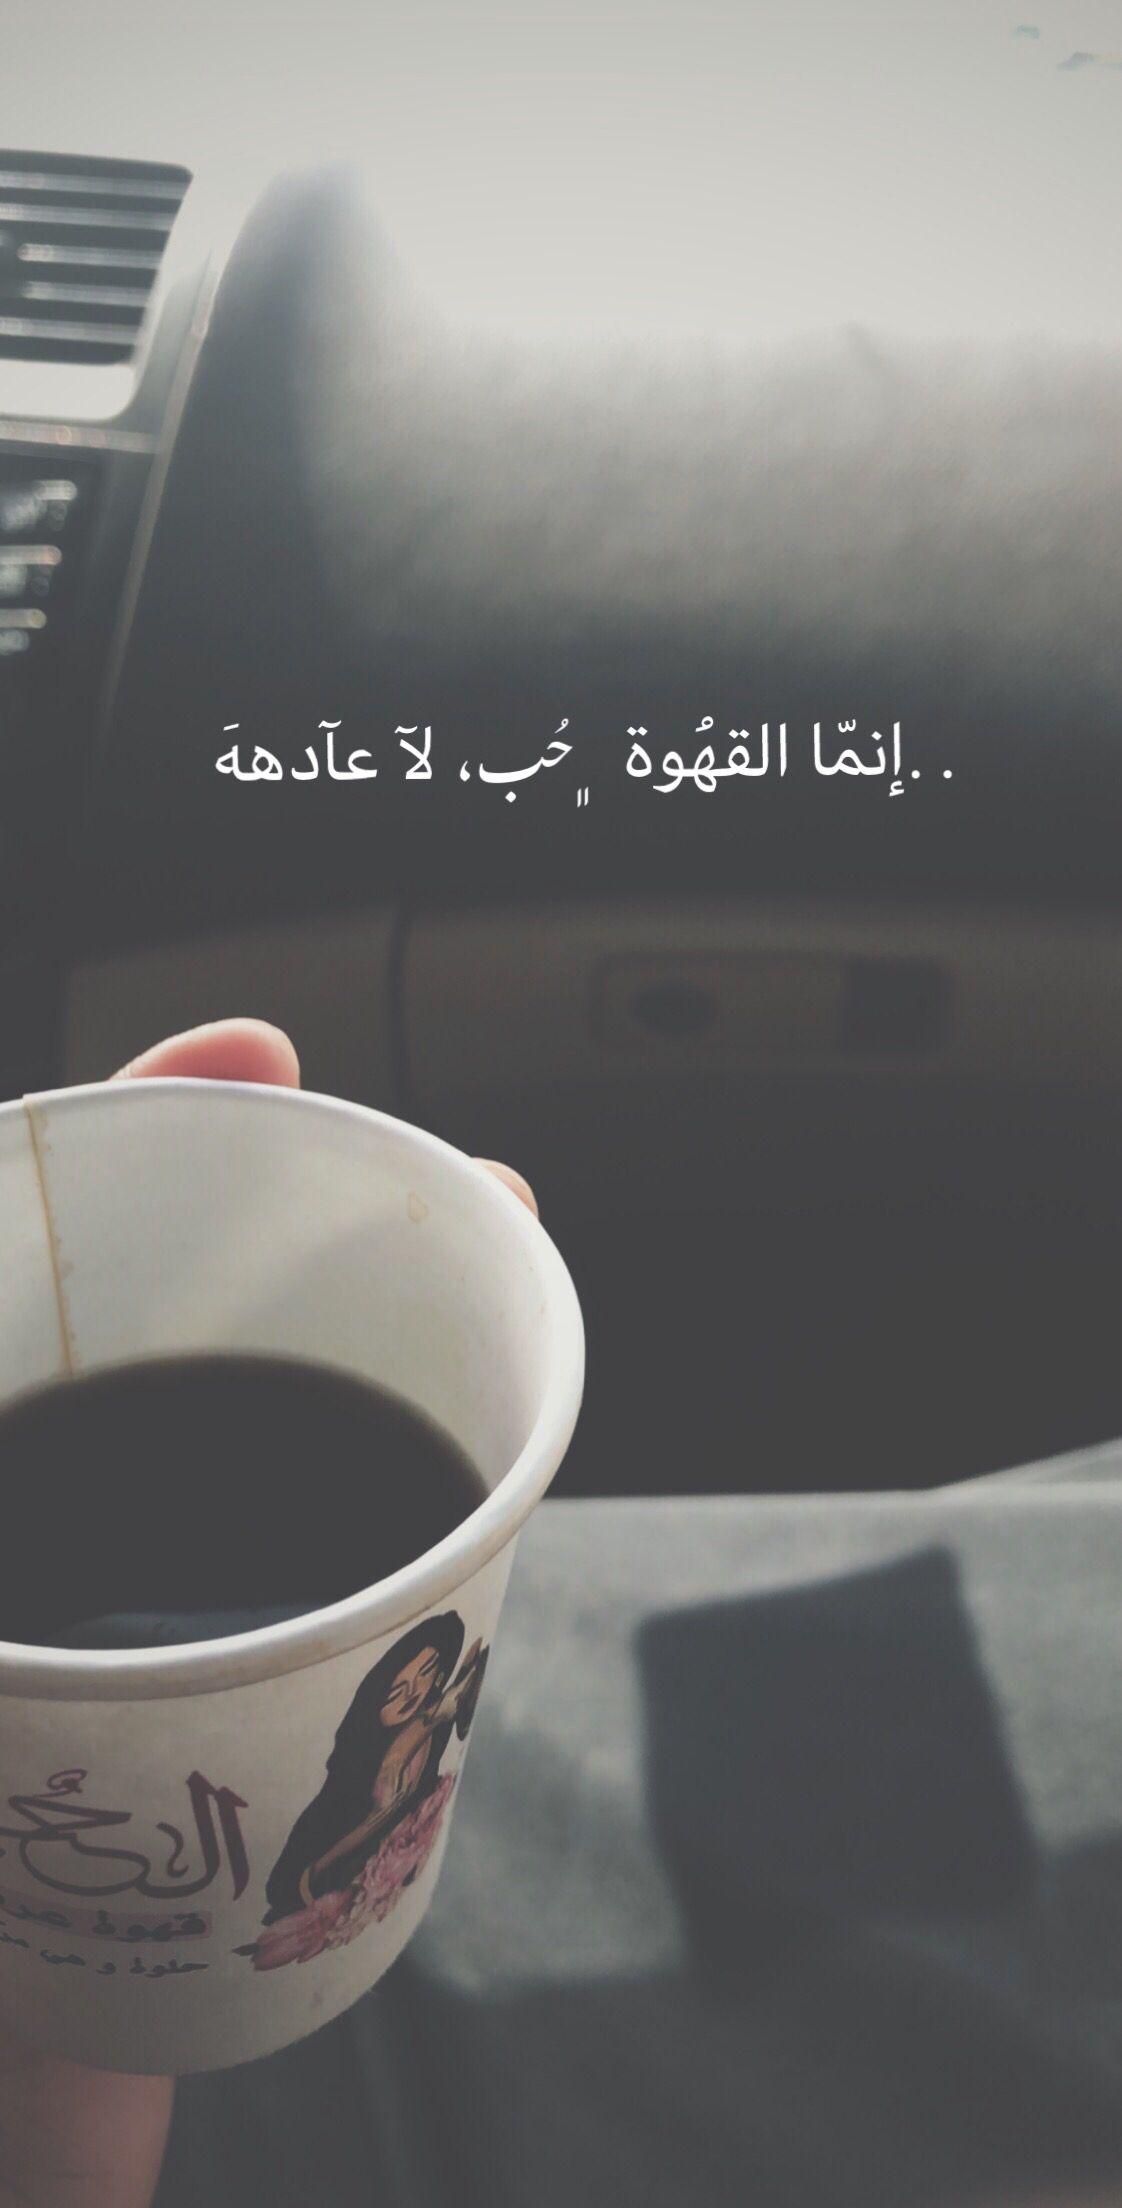 Coffee Quotes Cafe Photography قهوة اقتباسات تصويري Coffee Quotes Arabic Coffee Friday Coffee Quotes